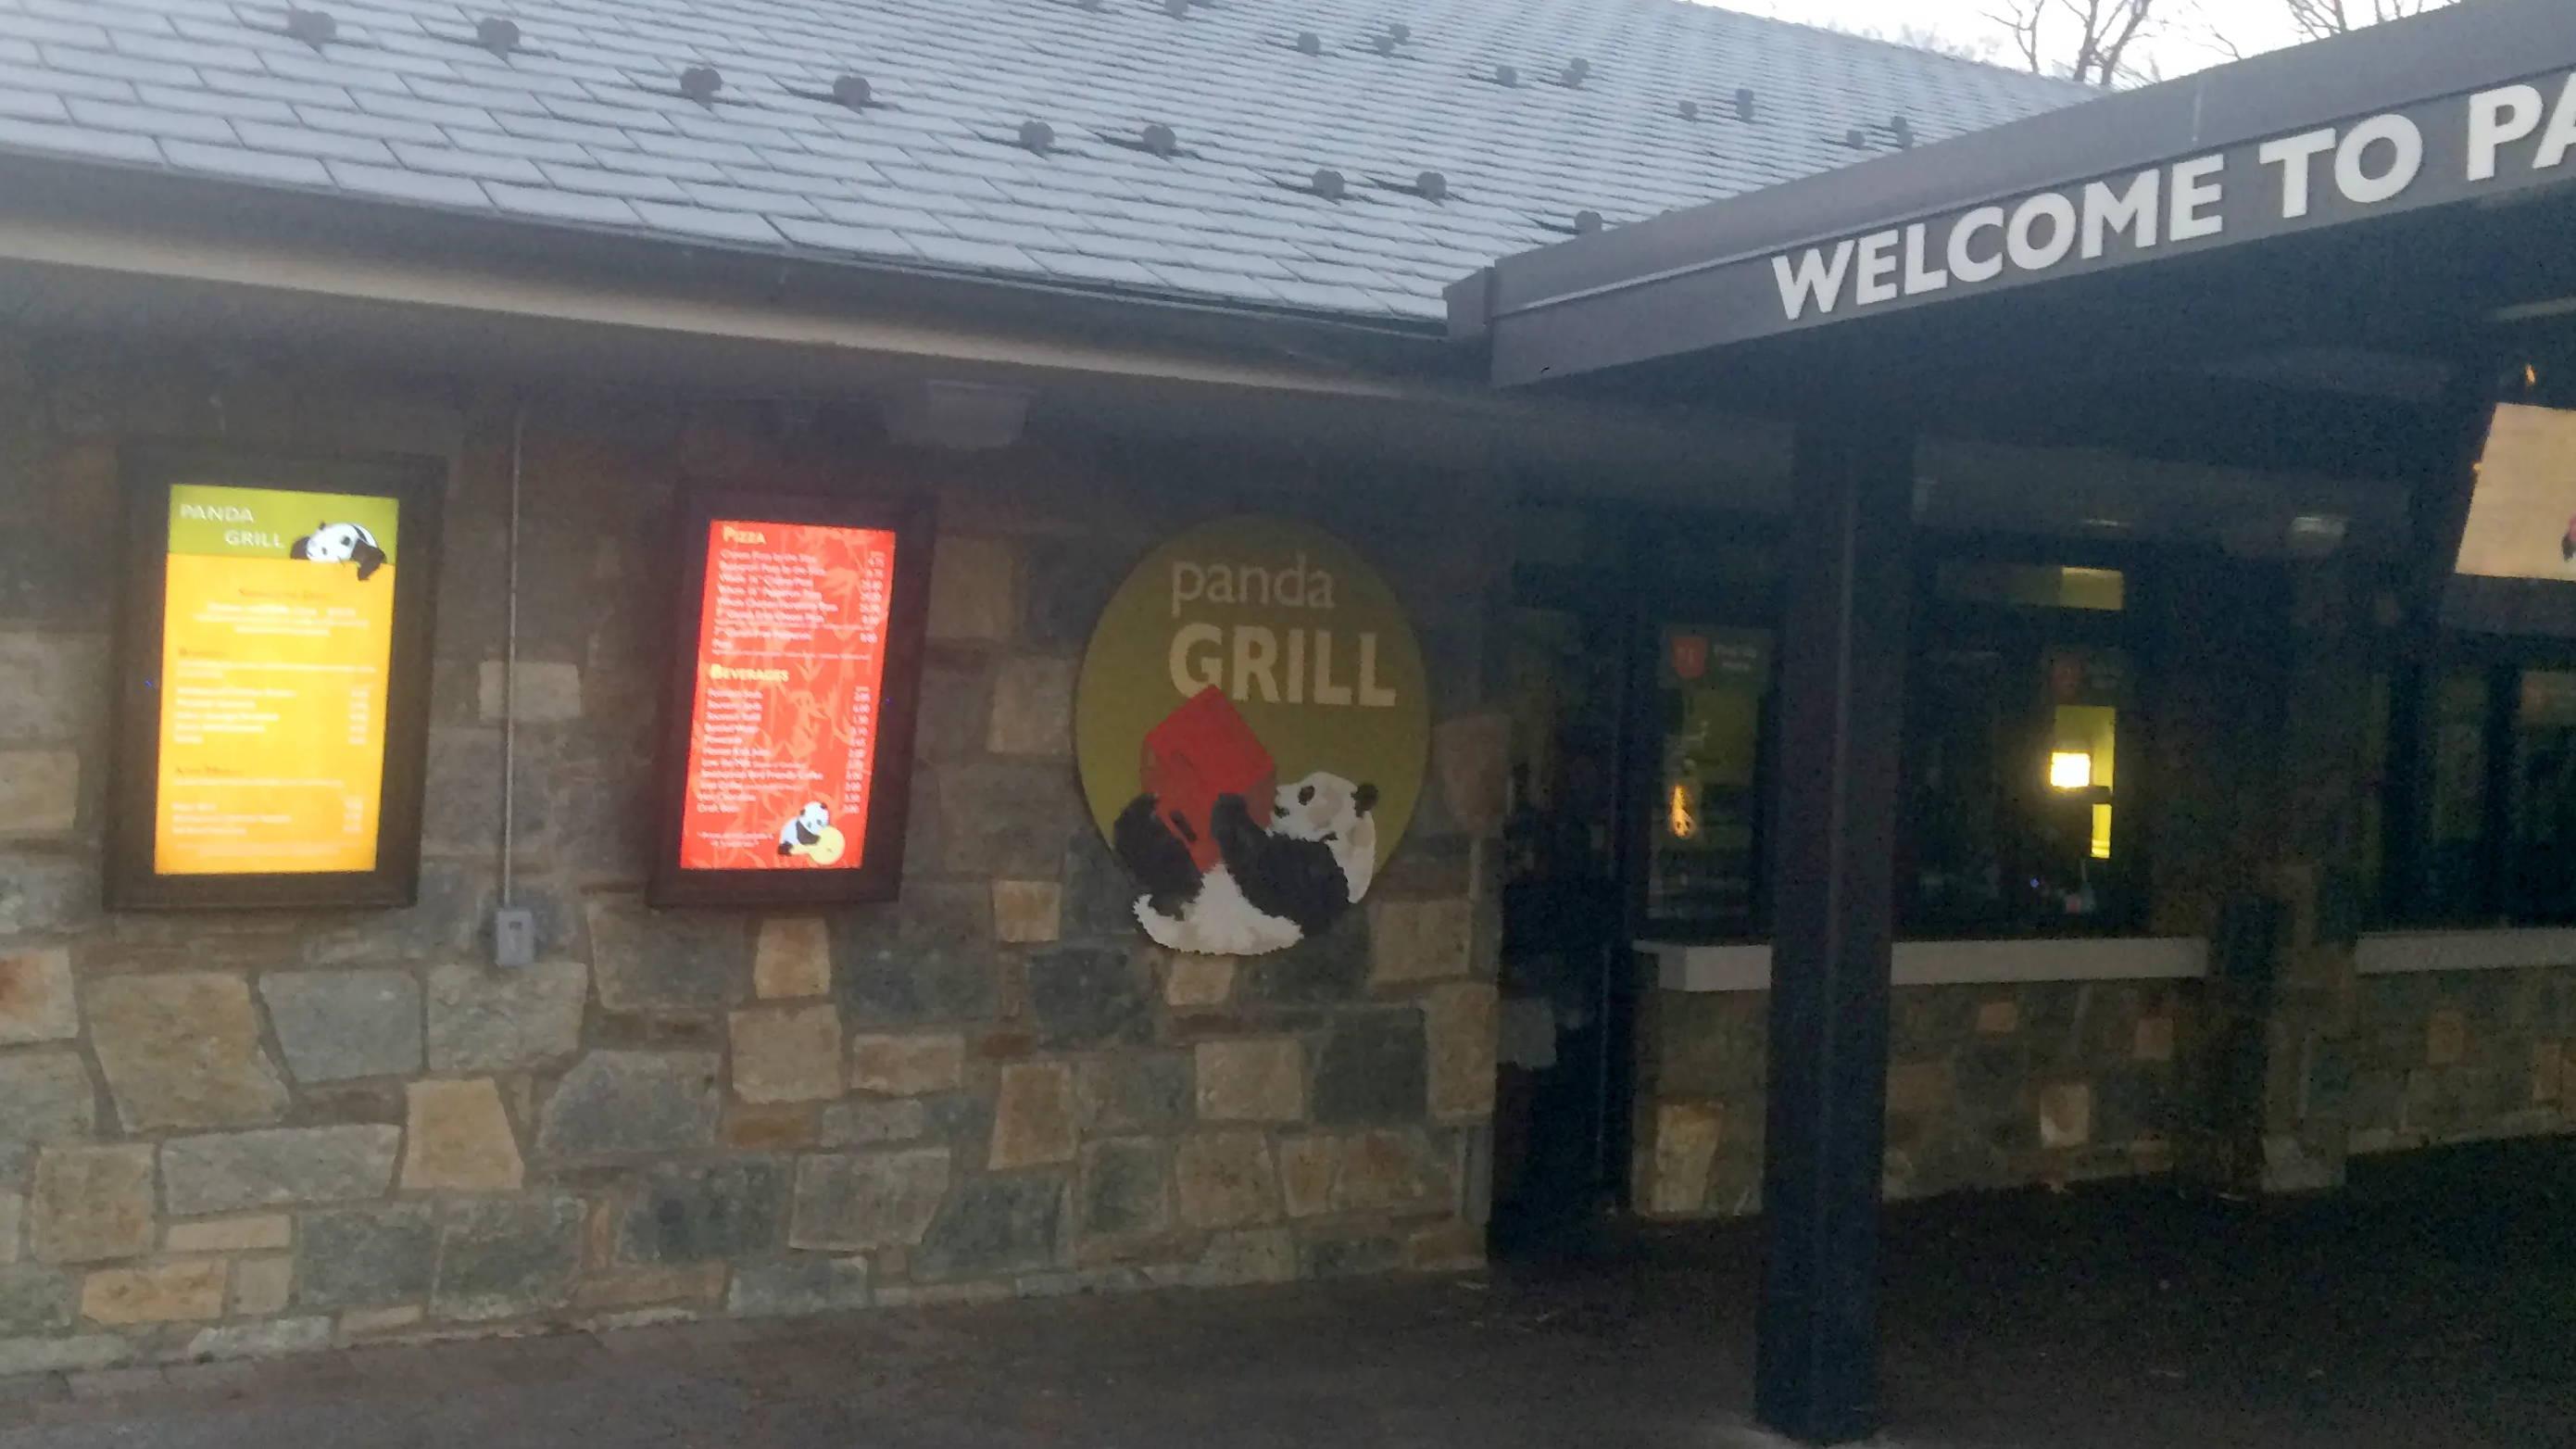 Panda Grill restaurant weatherproof TV digital signage cover